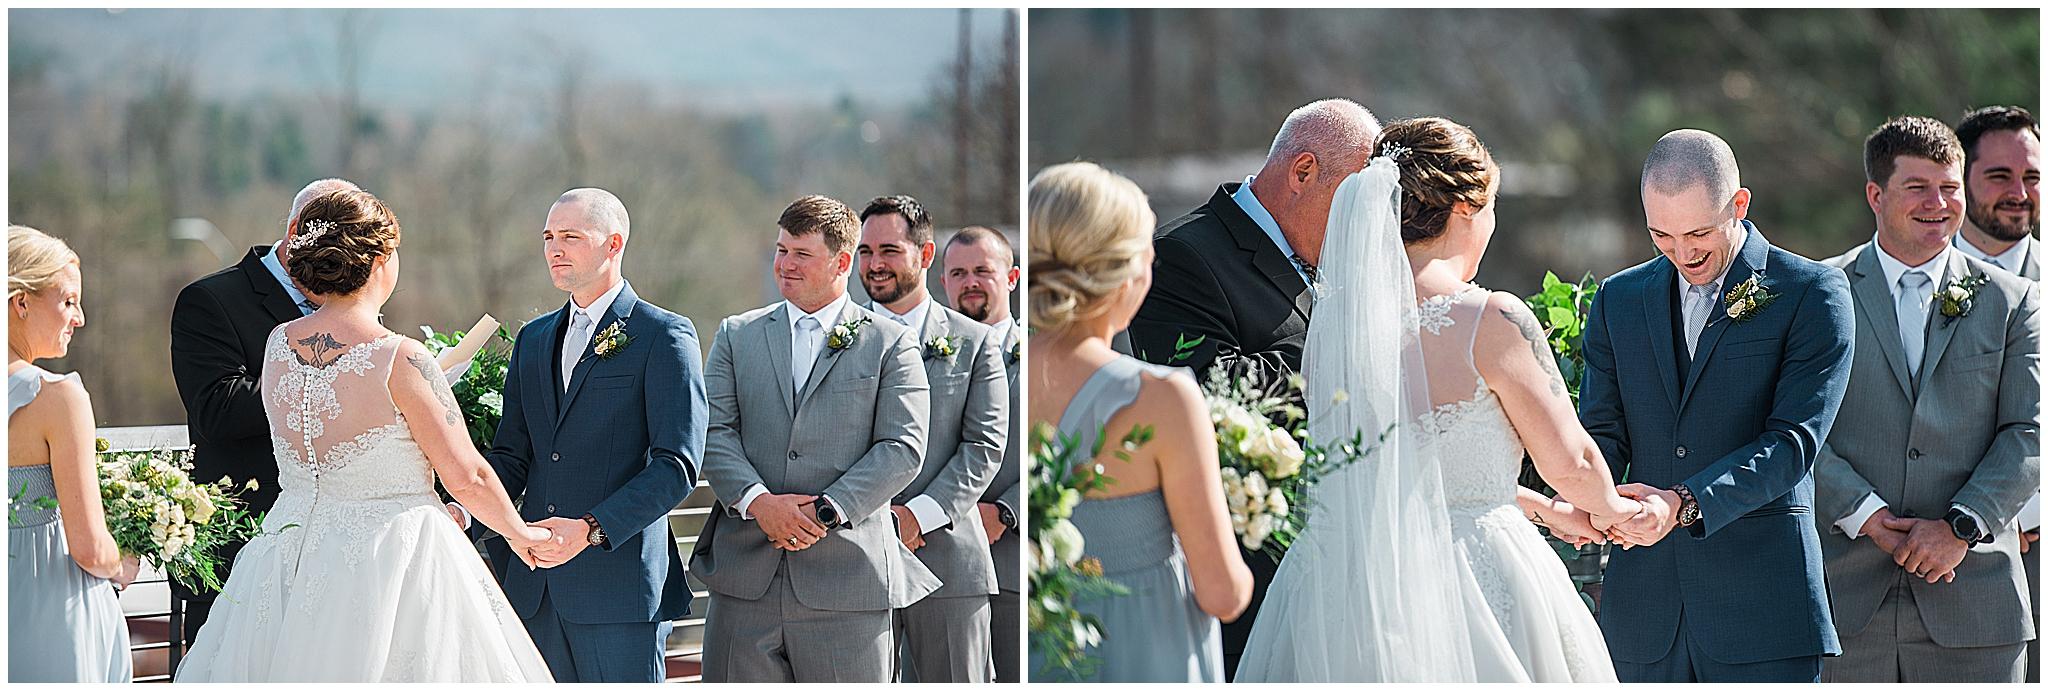 Wedding_Photographer_Asheville_Highland_Brewing_0012.jpg